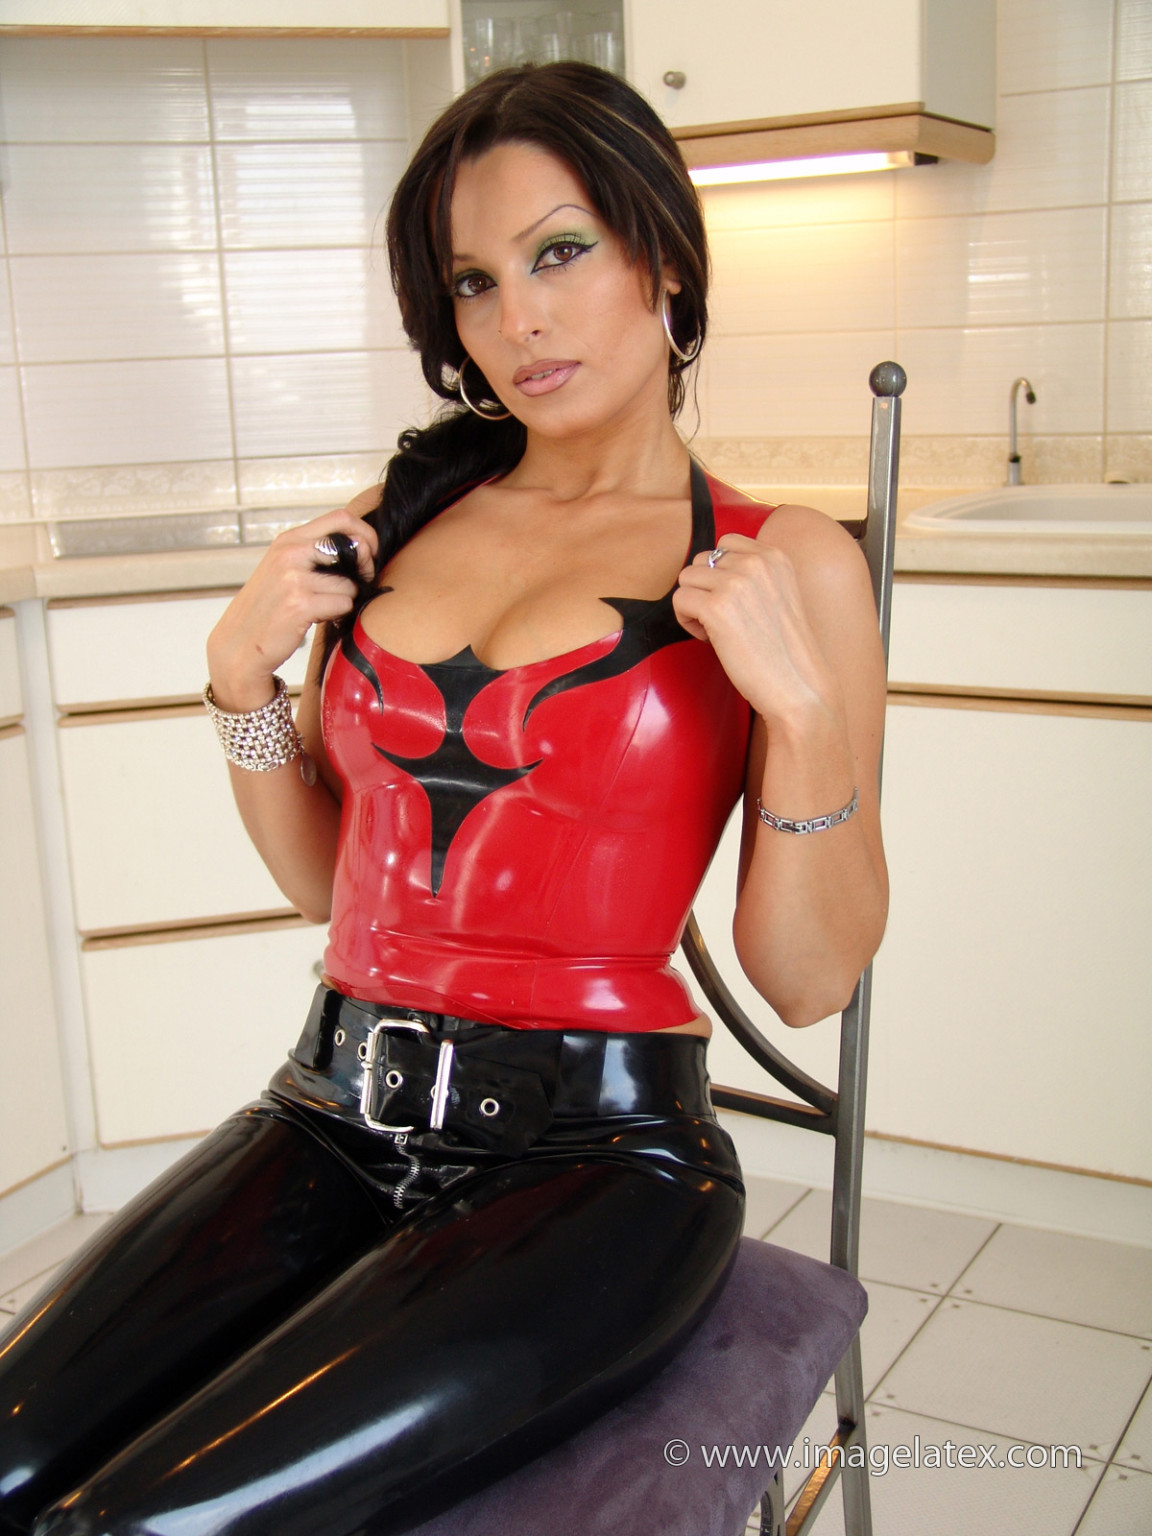 Izabella - Бразильянки - Порно галерея № 3530497